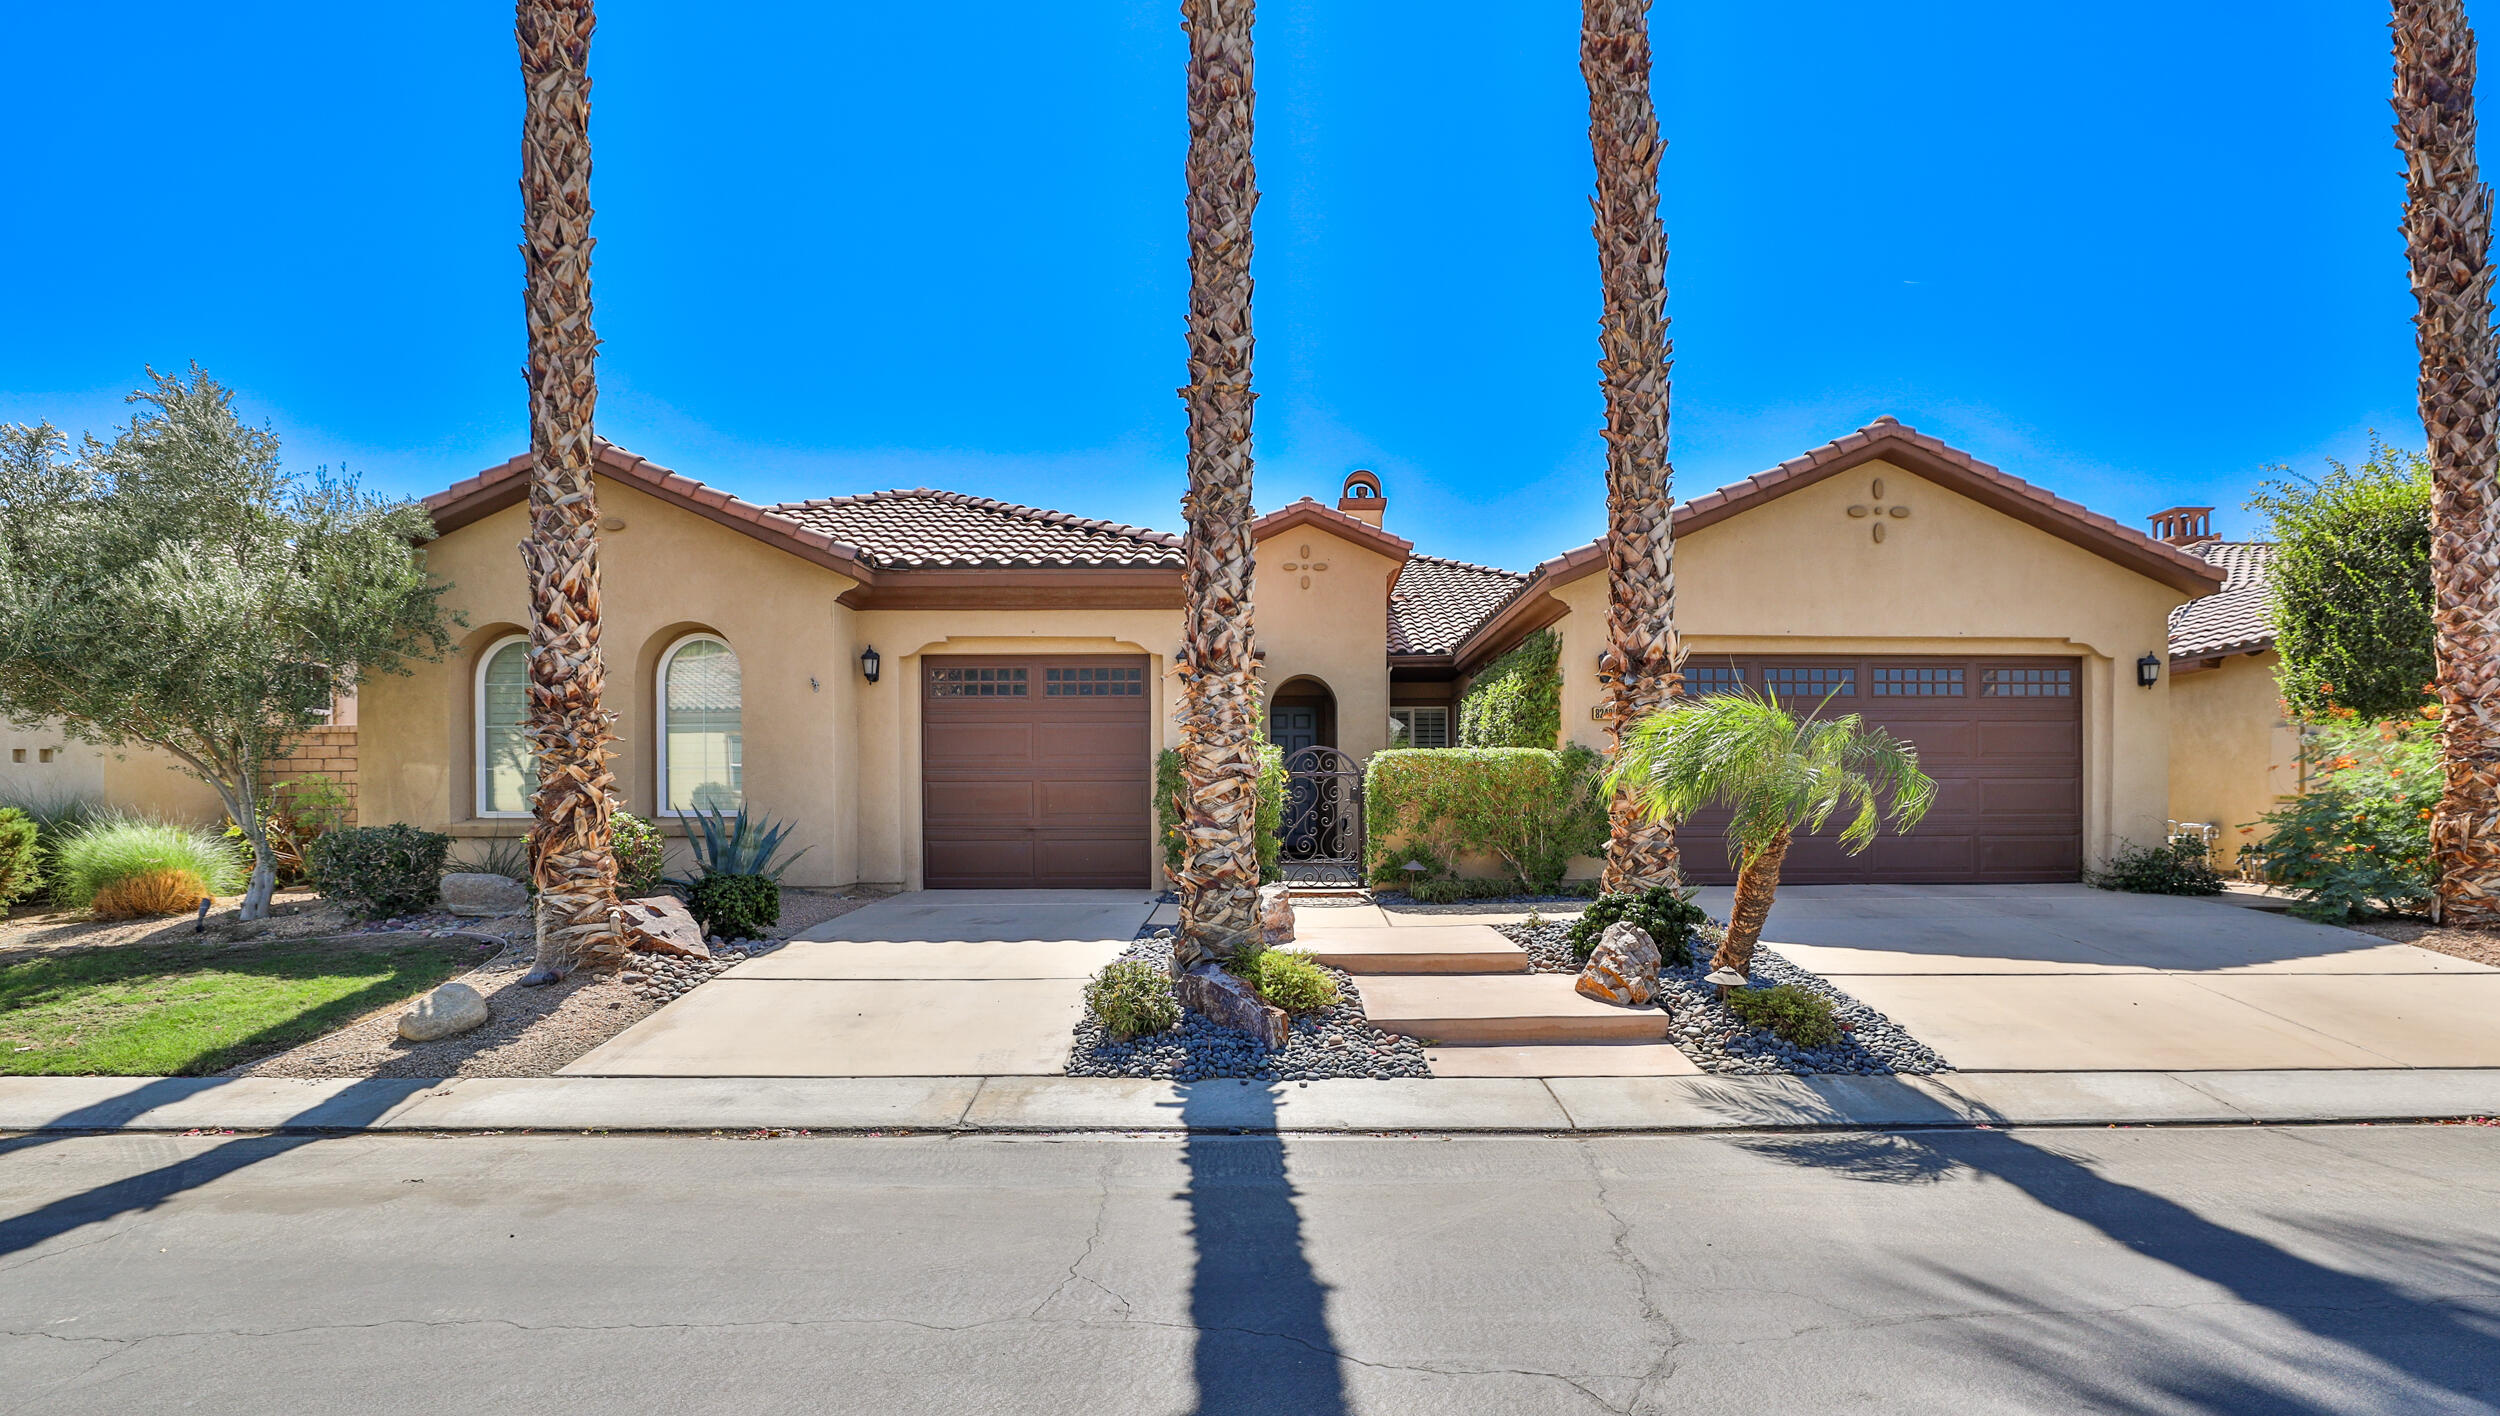 Photo of 82435 Stradivari Road, Indio, CA 92203